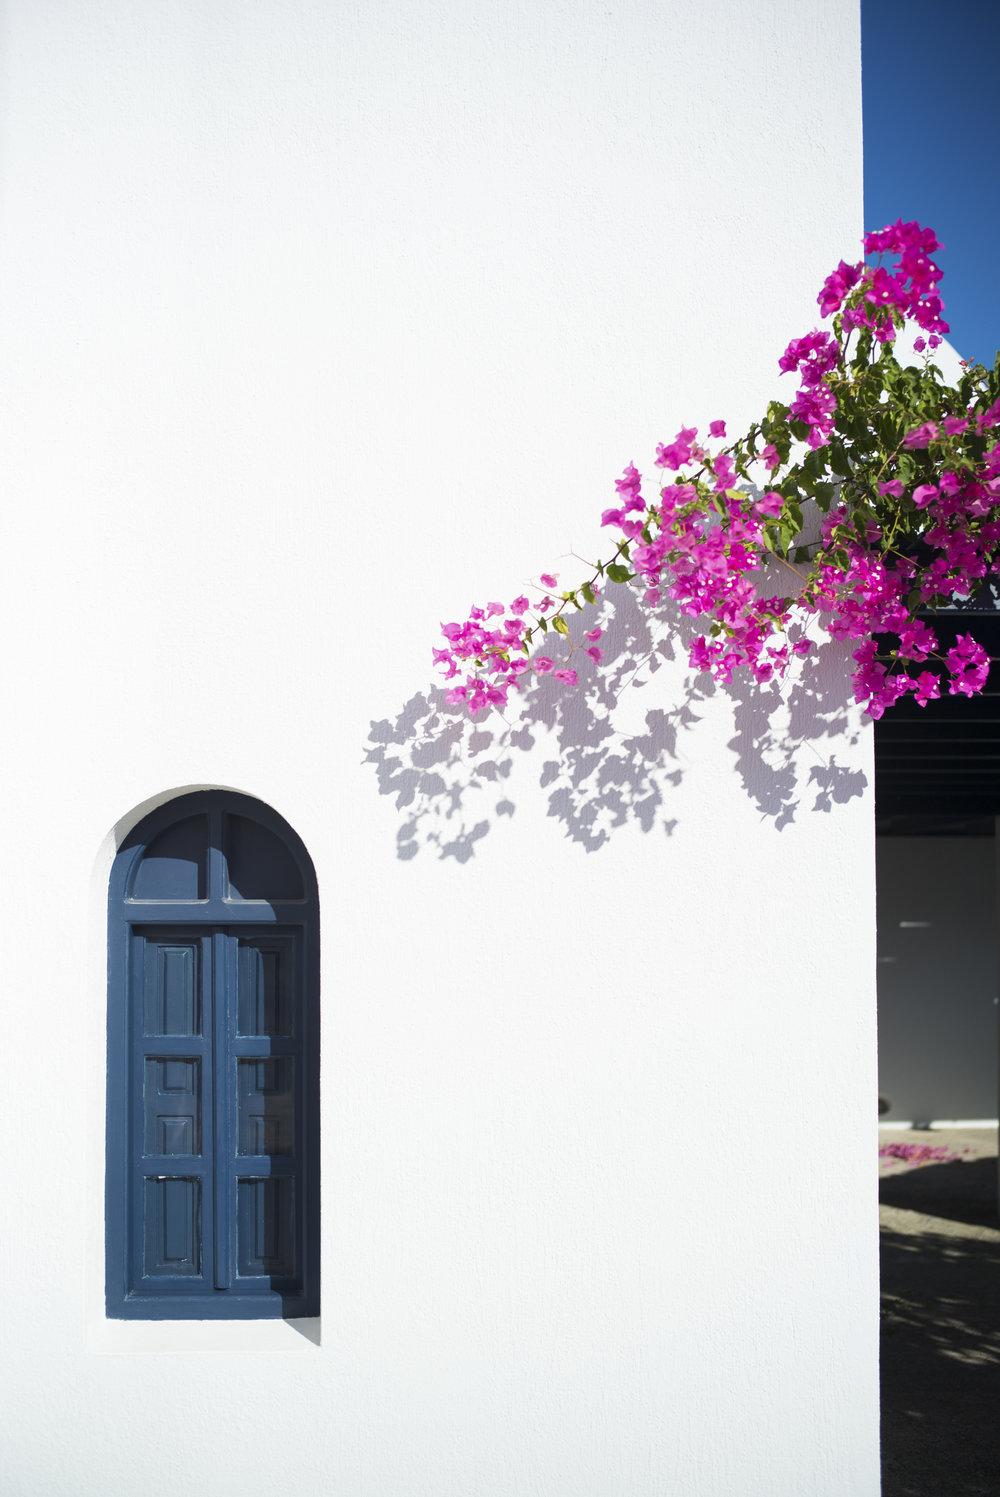 Greece-0718-L1003184.jpg